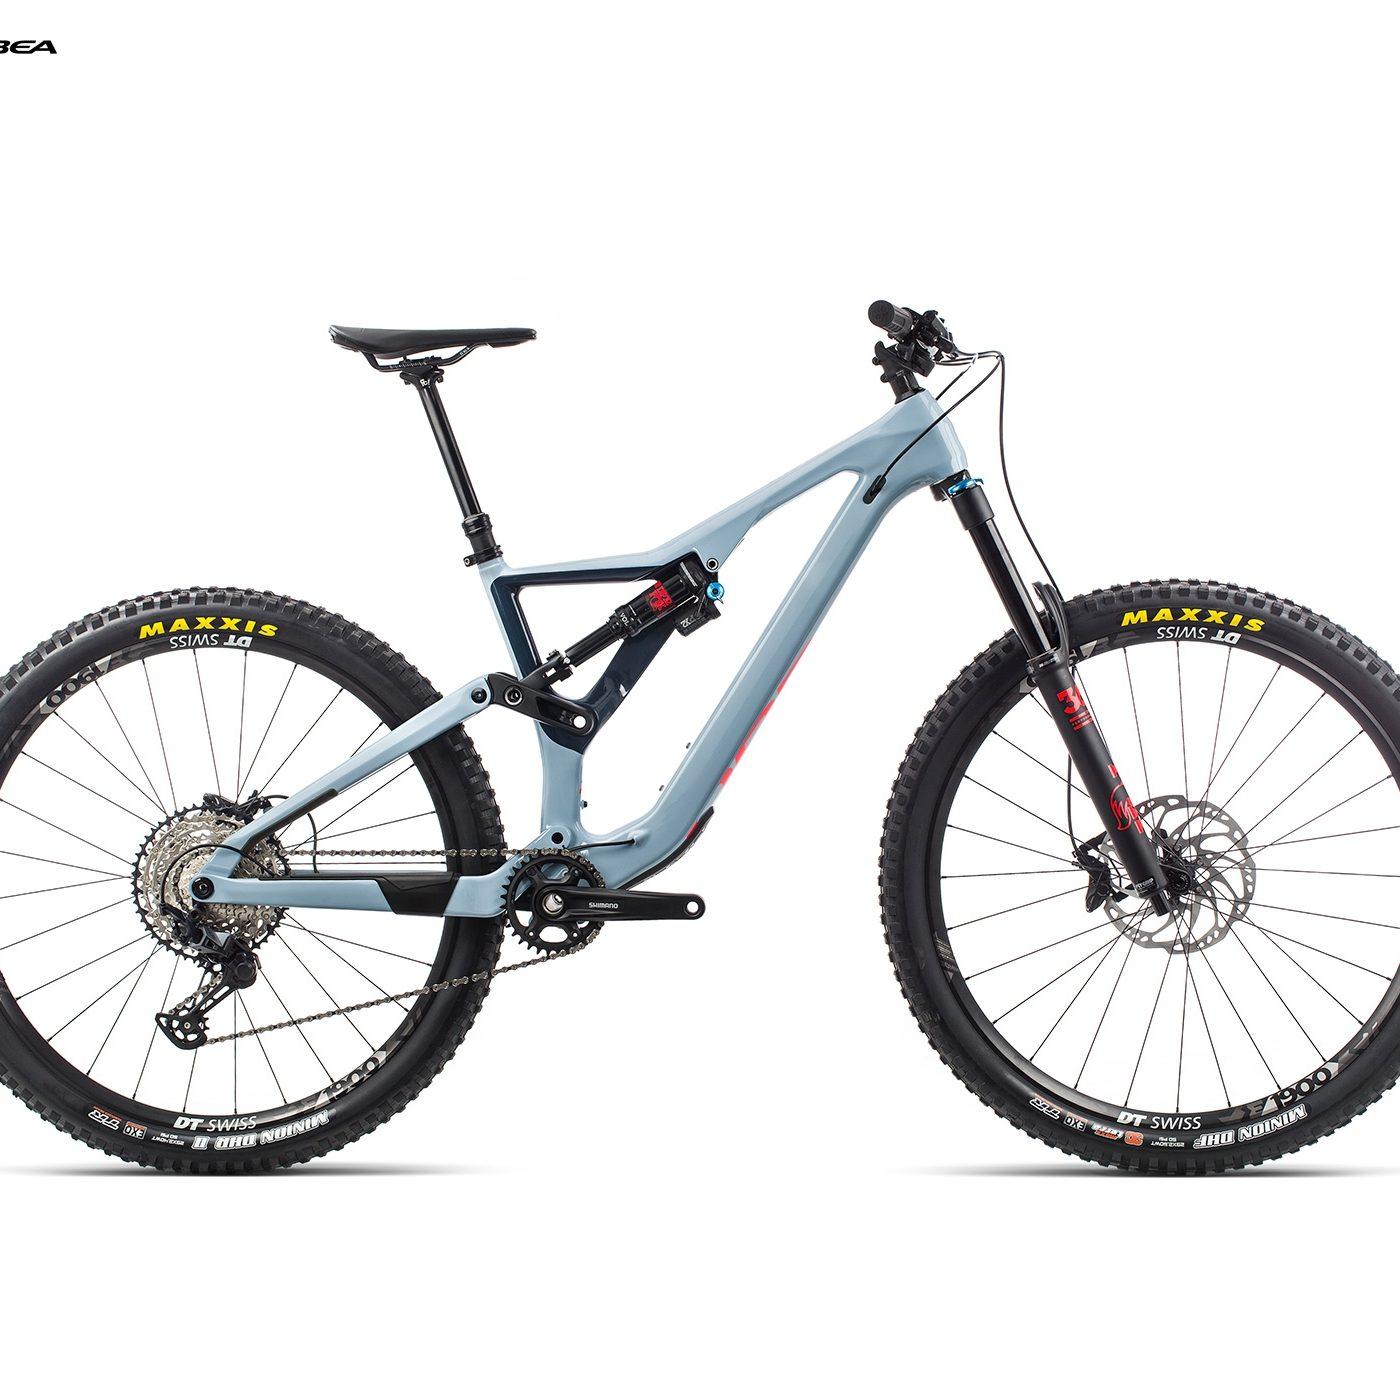 ORBEA RALLON M20 - BLAUW GRIJS / BRIGHT RED (GLOSS) @G-Bikes